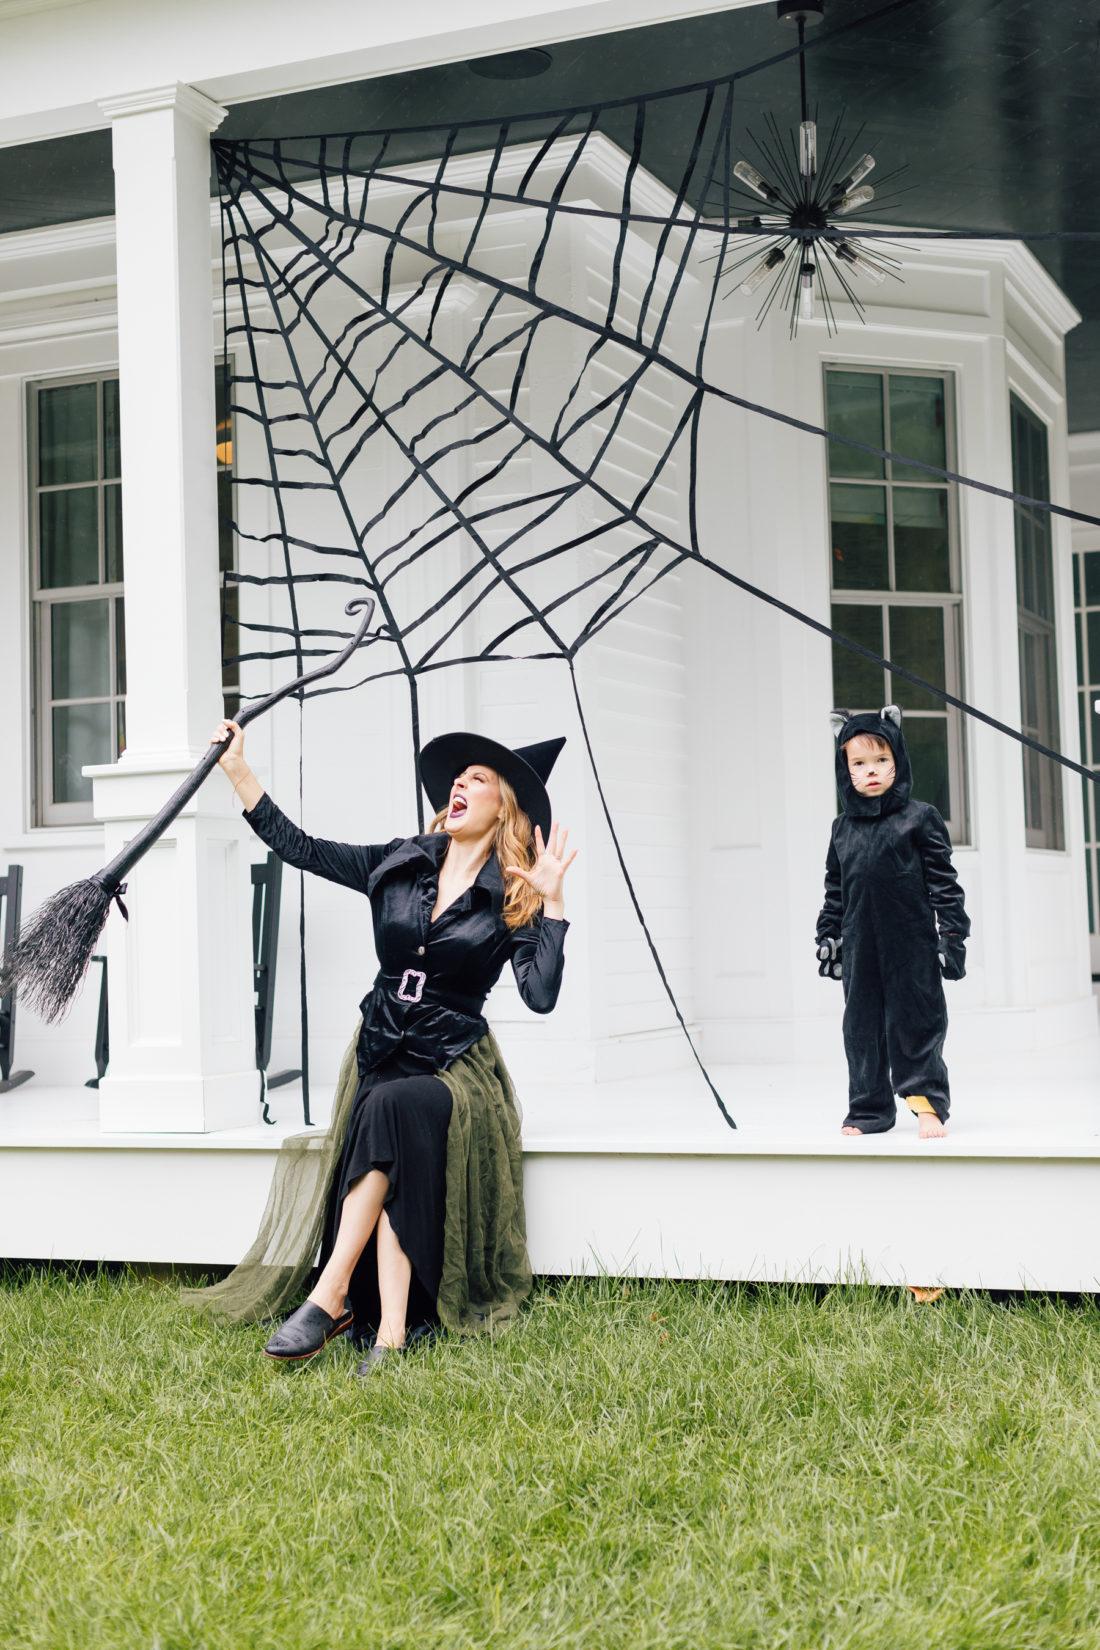 Eva Amurri Martino and son Major dress up their house for Halloween